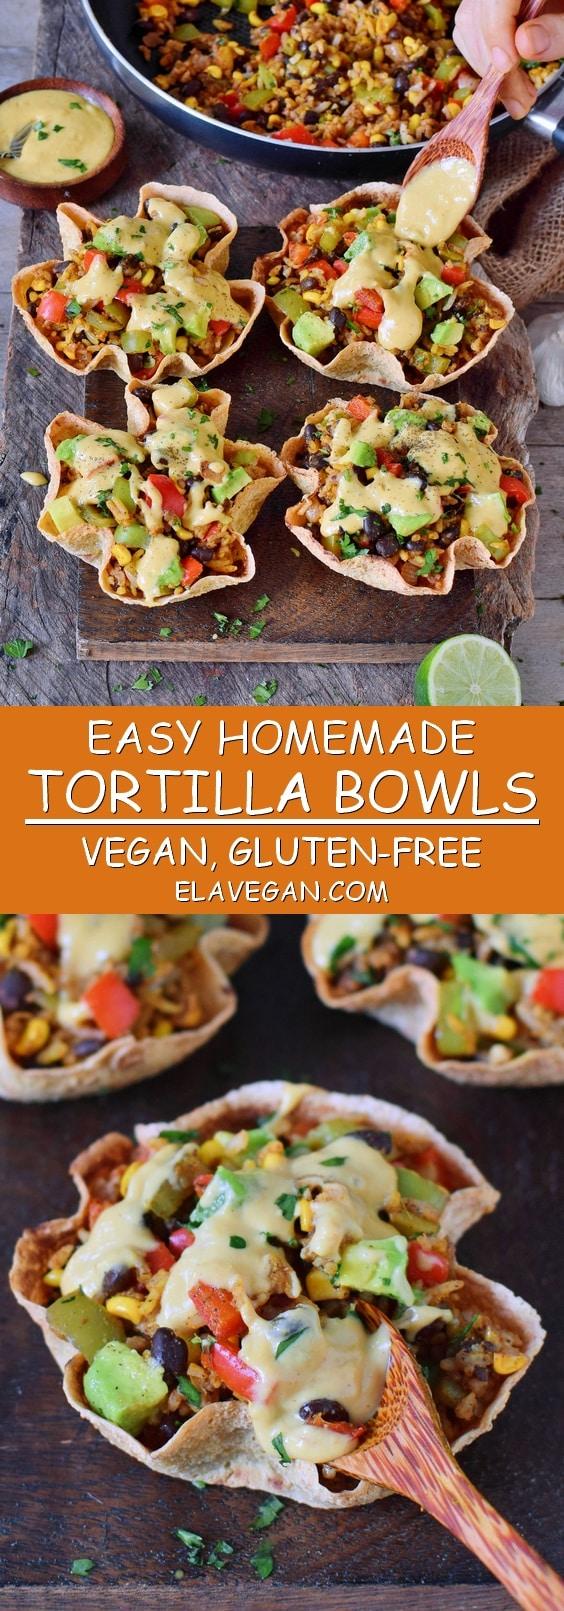 easy homemade gluten-free tortilla bowls aka taco cups with veggies avocado vegan cheese sauce black beans and corn